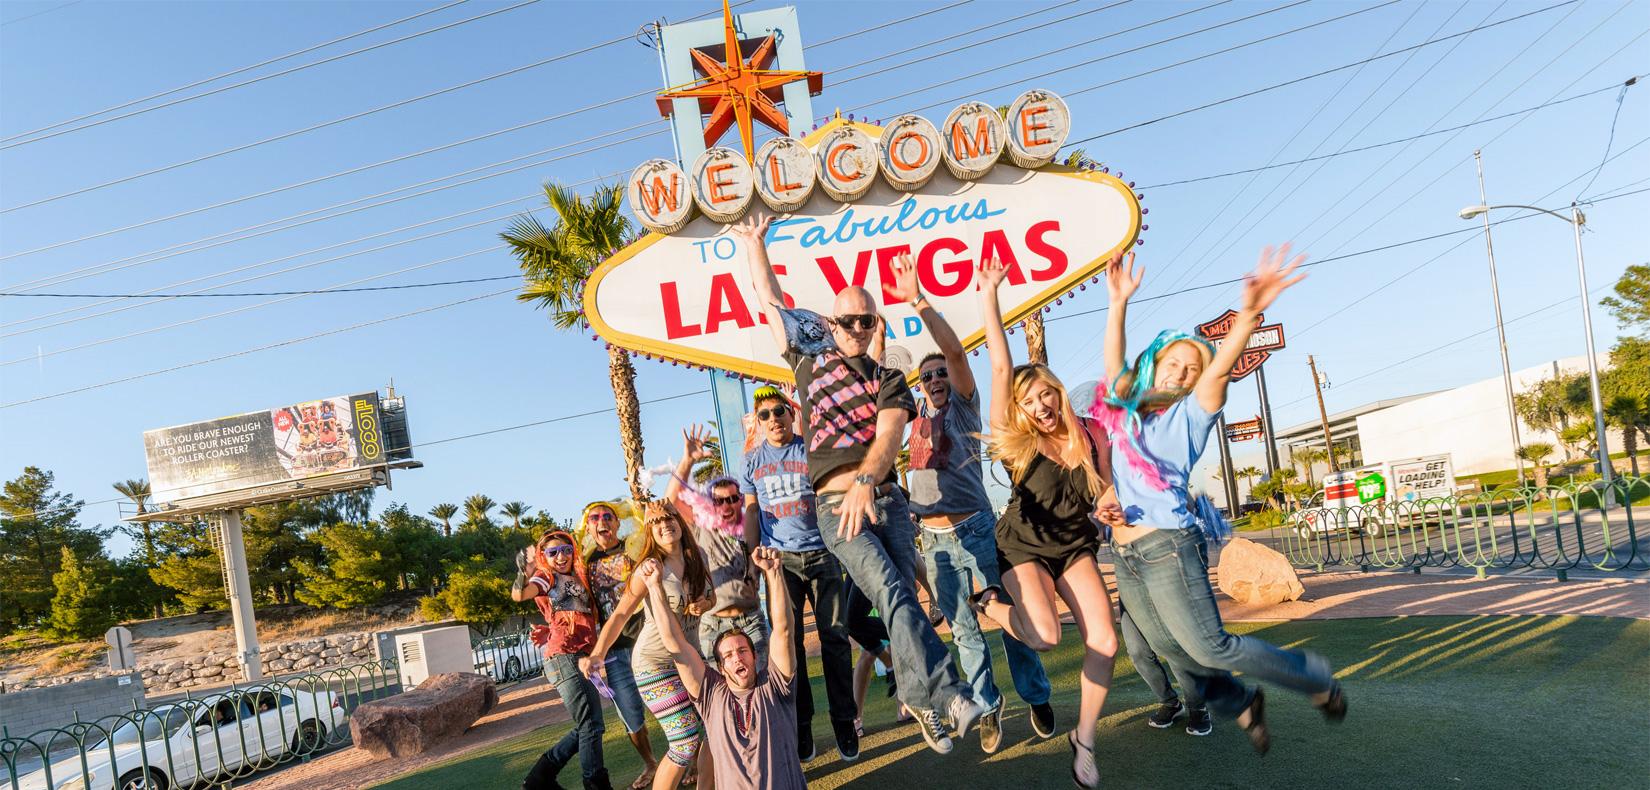 Las Vegas Welcome Sign, Menschen, Party, Freude